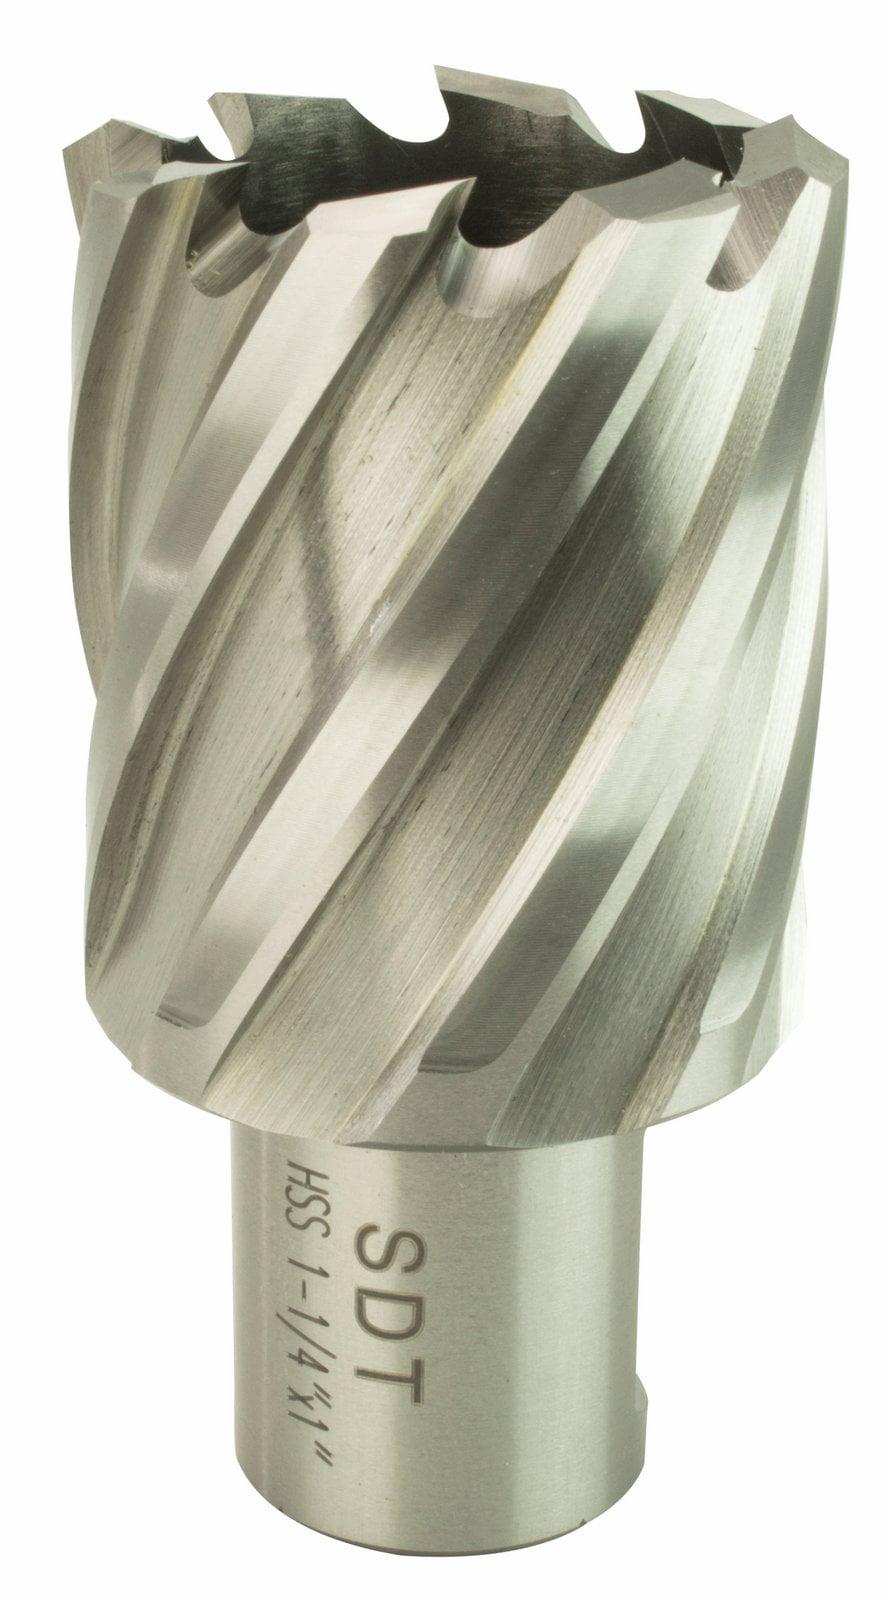 "1-7//8/"" X 2/"" High Speed Steel Annular Cutter With 3//4/"" Weldon Shank"